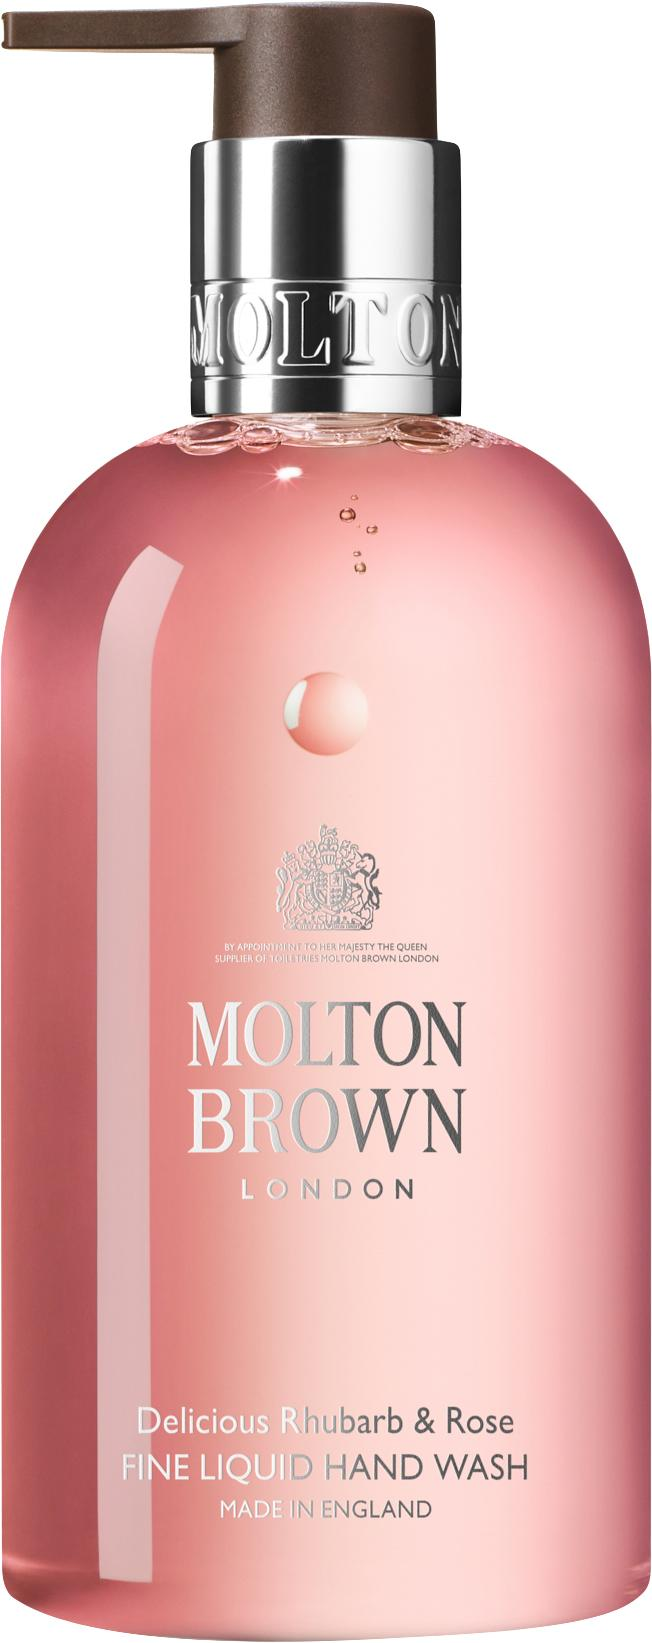 Vloeibare handzeep Molton (rabarber en rozen), Houder: recyclebare kunststof, Roze, Ø 6 x H 15 cm